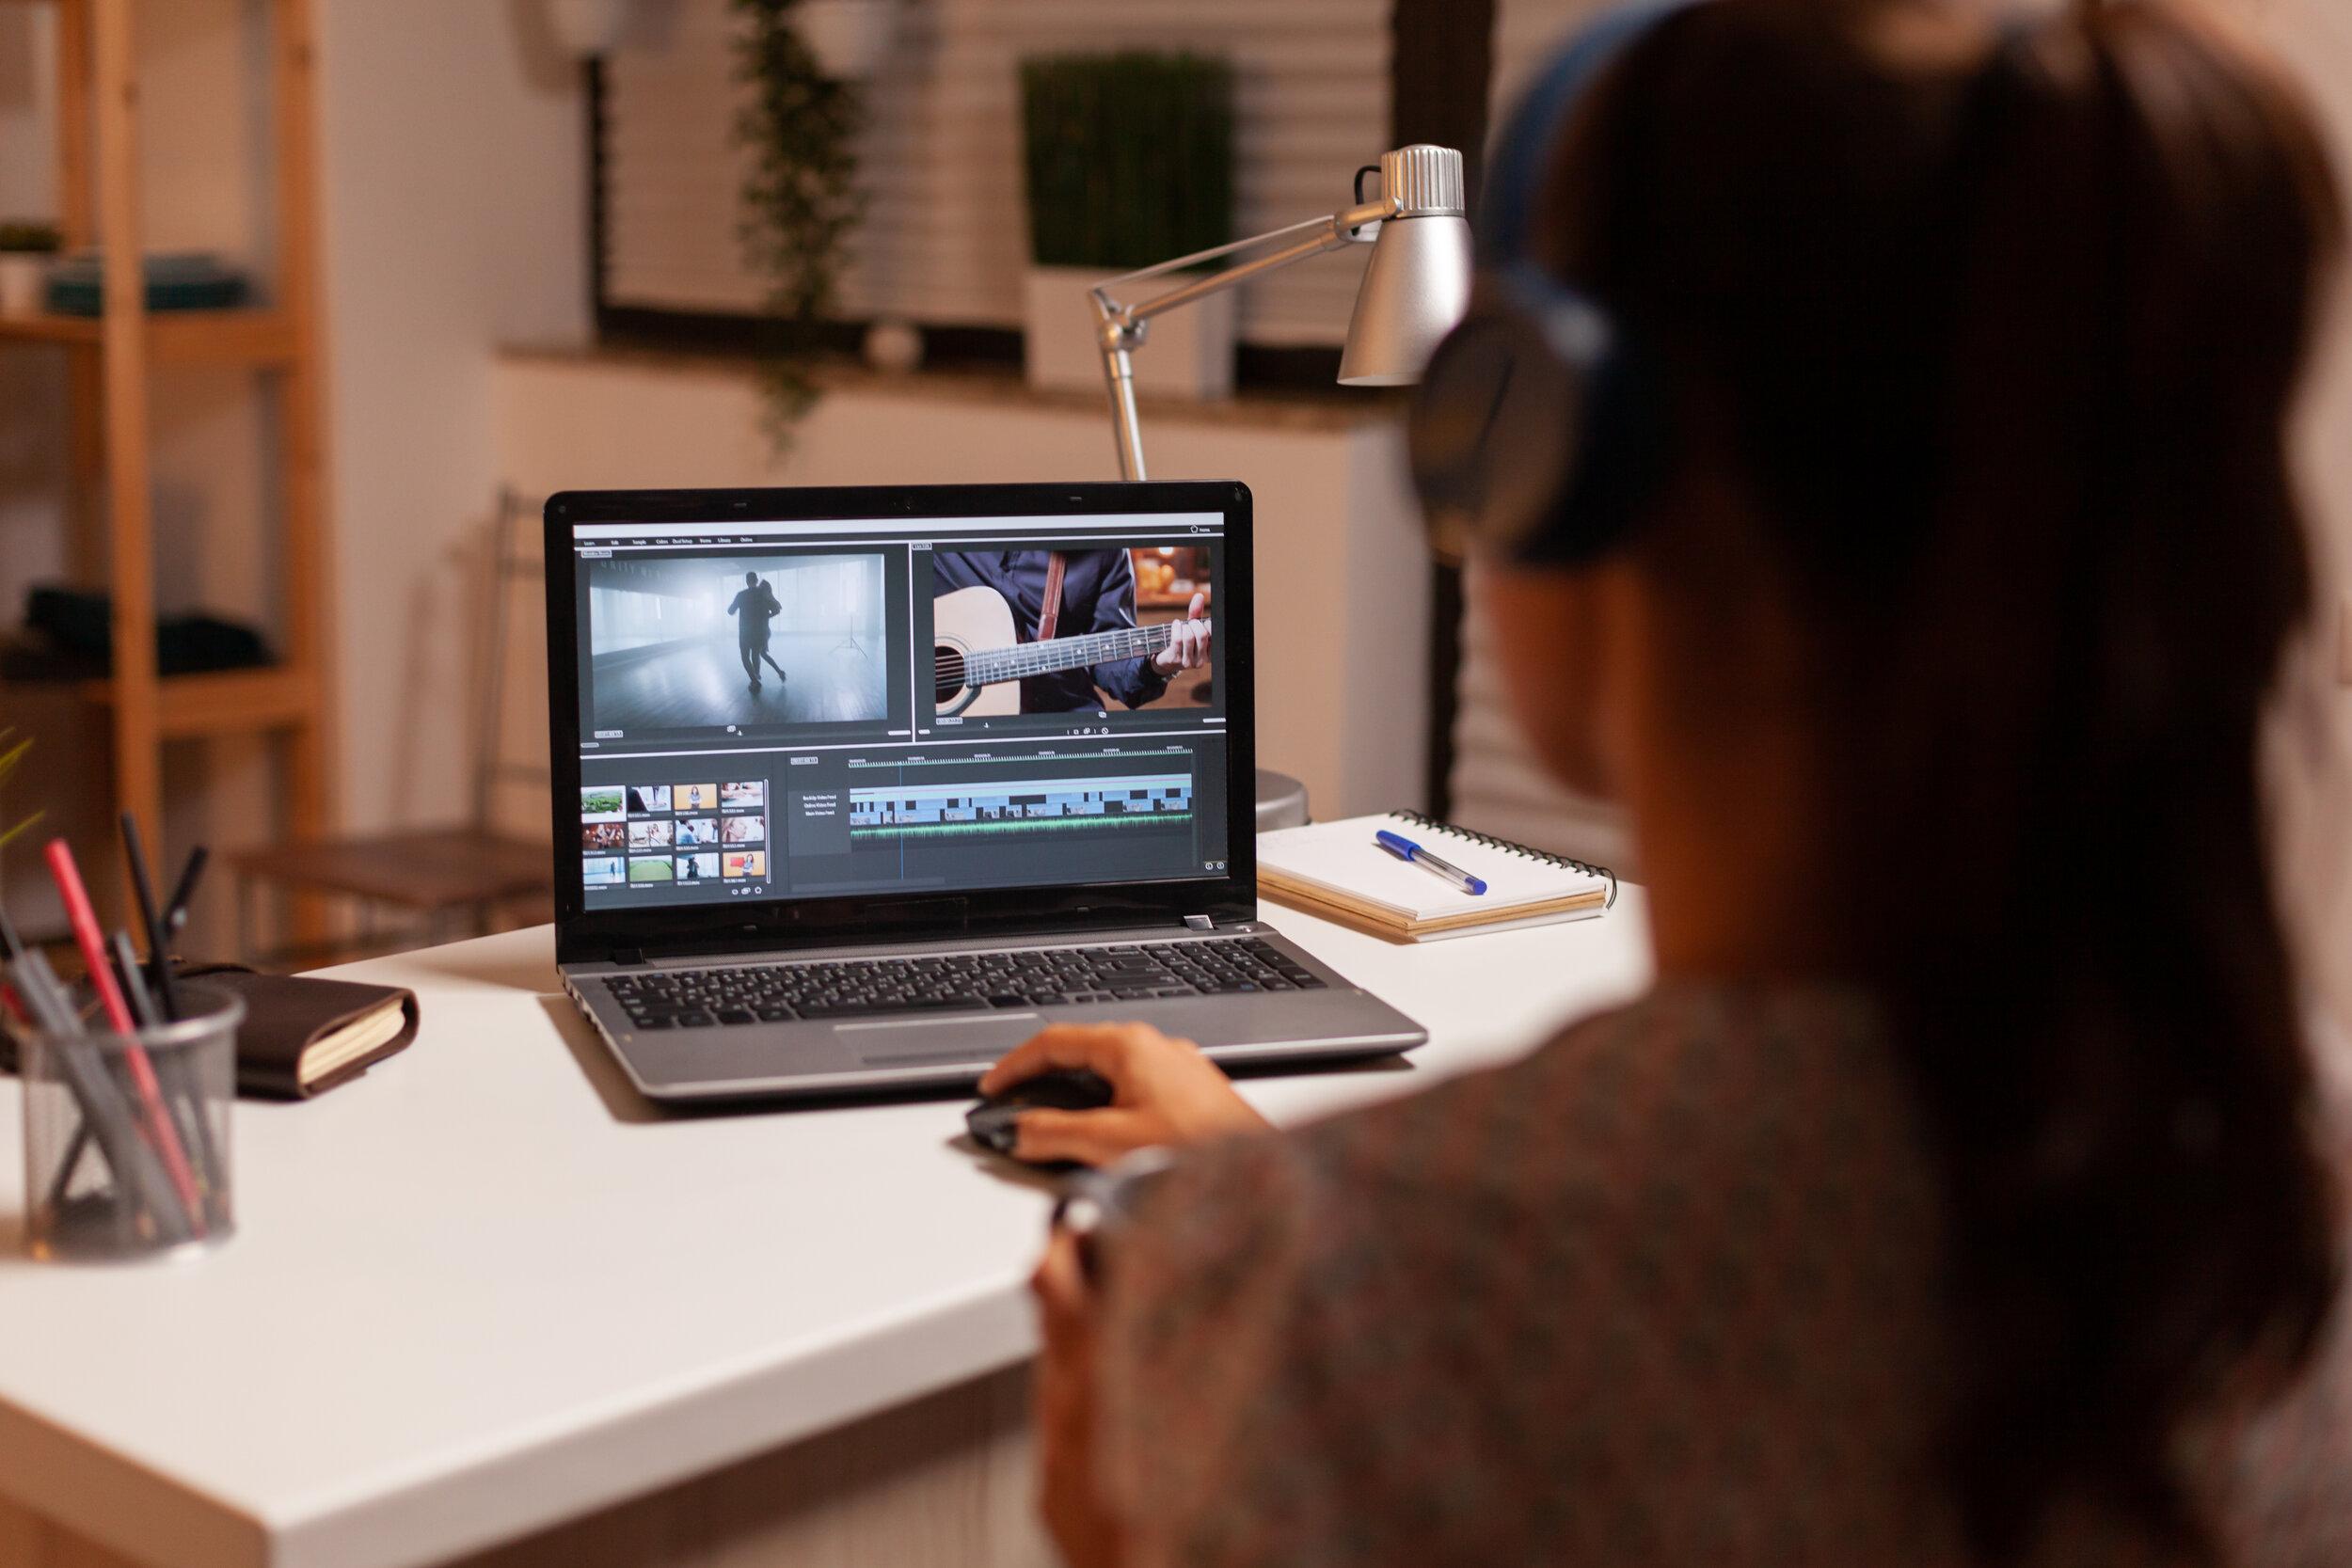 filmmaker-editing-video-footage-5VX7ALY.JPG